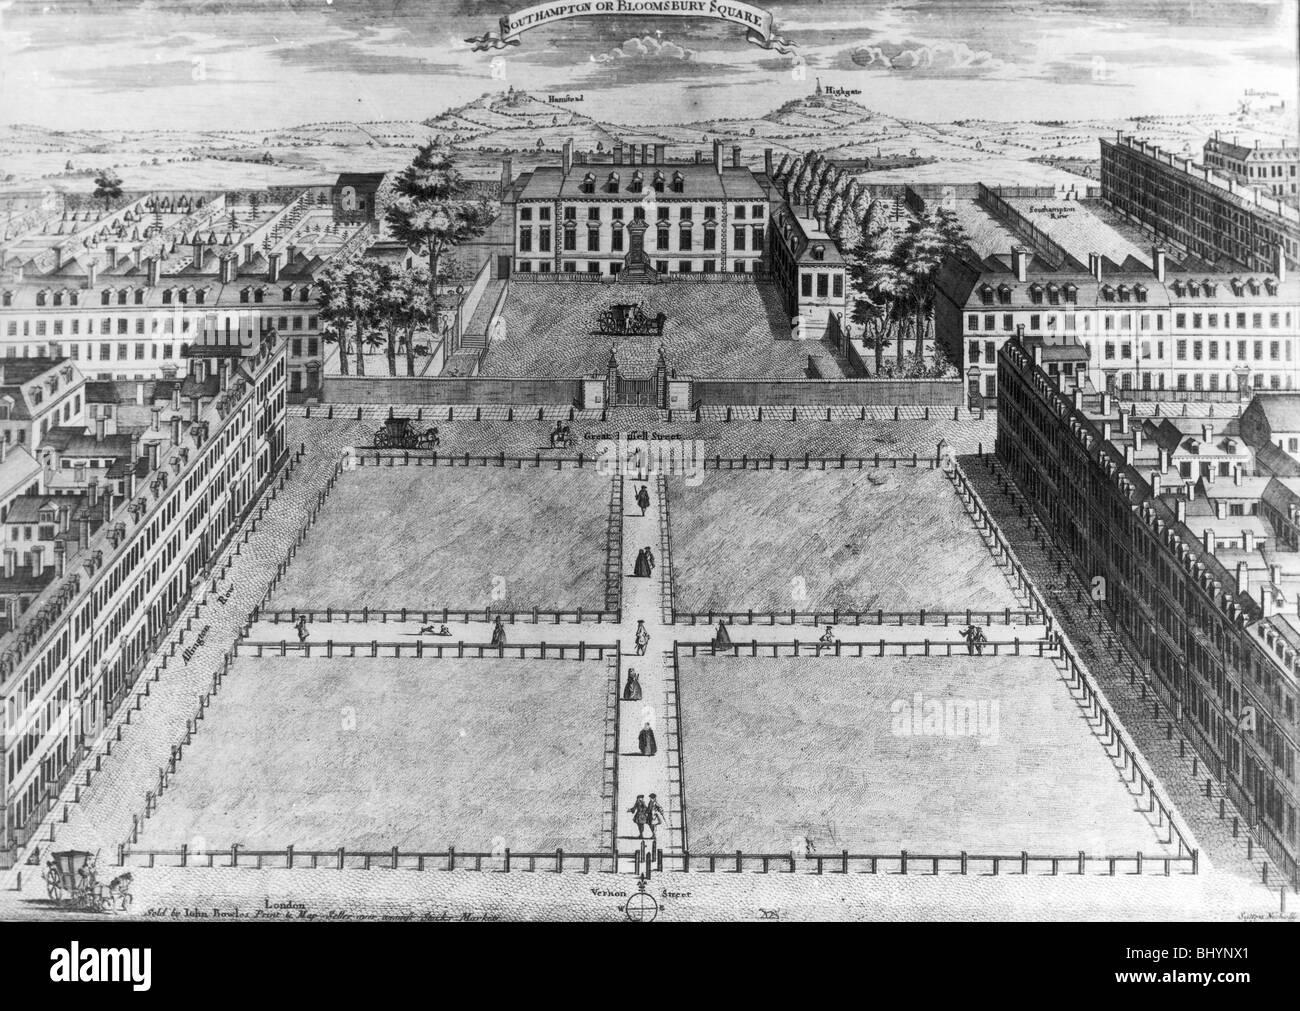 'Southampton or Bloomsbury Square', London, c1725. Artist: Sutton Nicholls - Stock Image